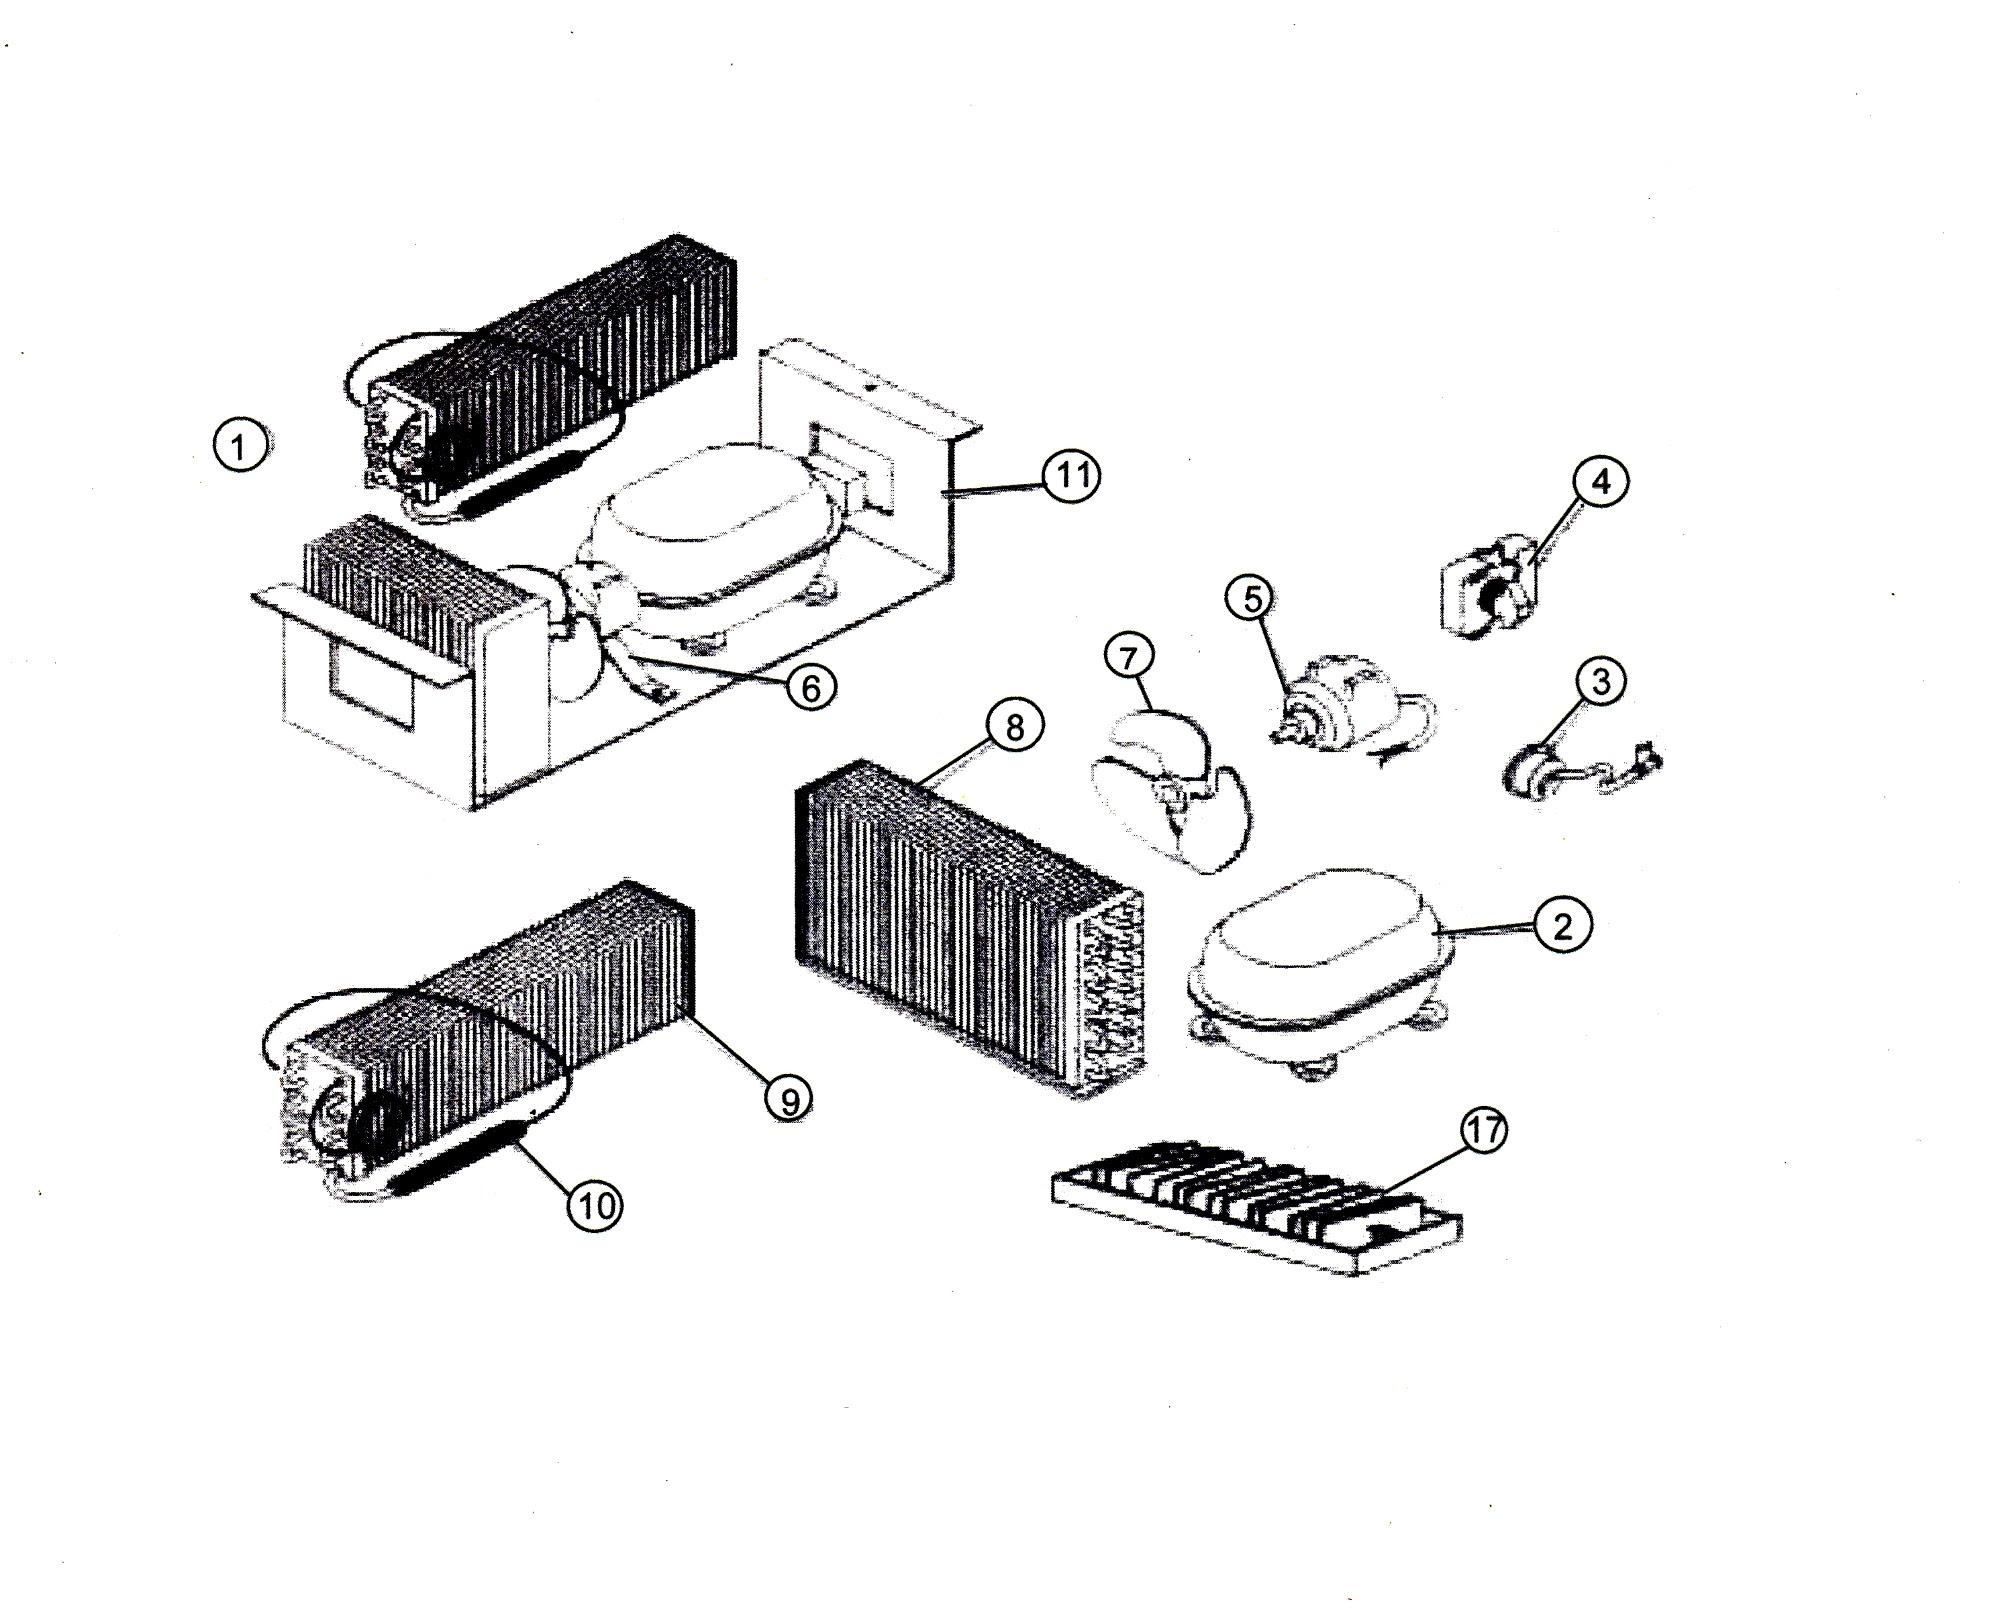 Wiring Diagram: 31 Beverage Air Bm23 Parts Diagram